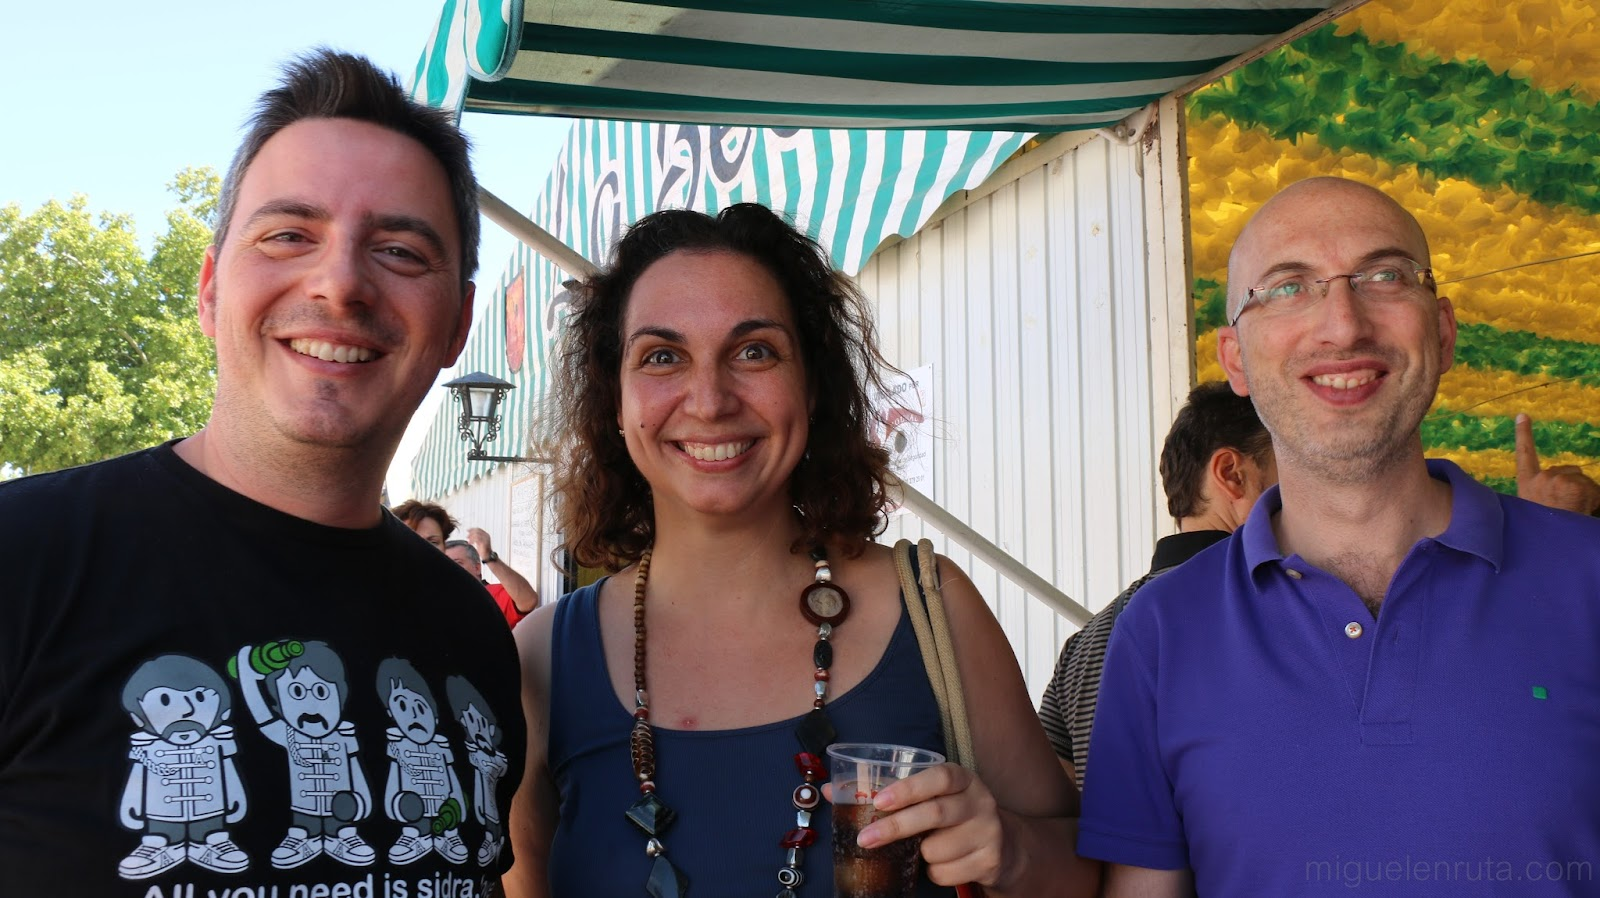 Fotos-retratos-Feria-de-Albacete_9